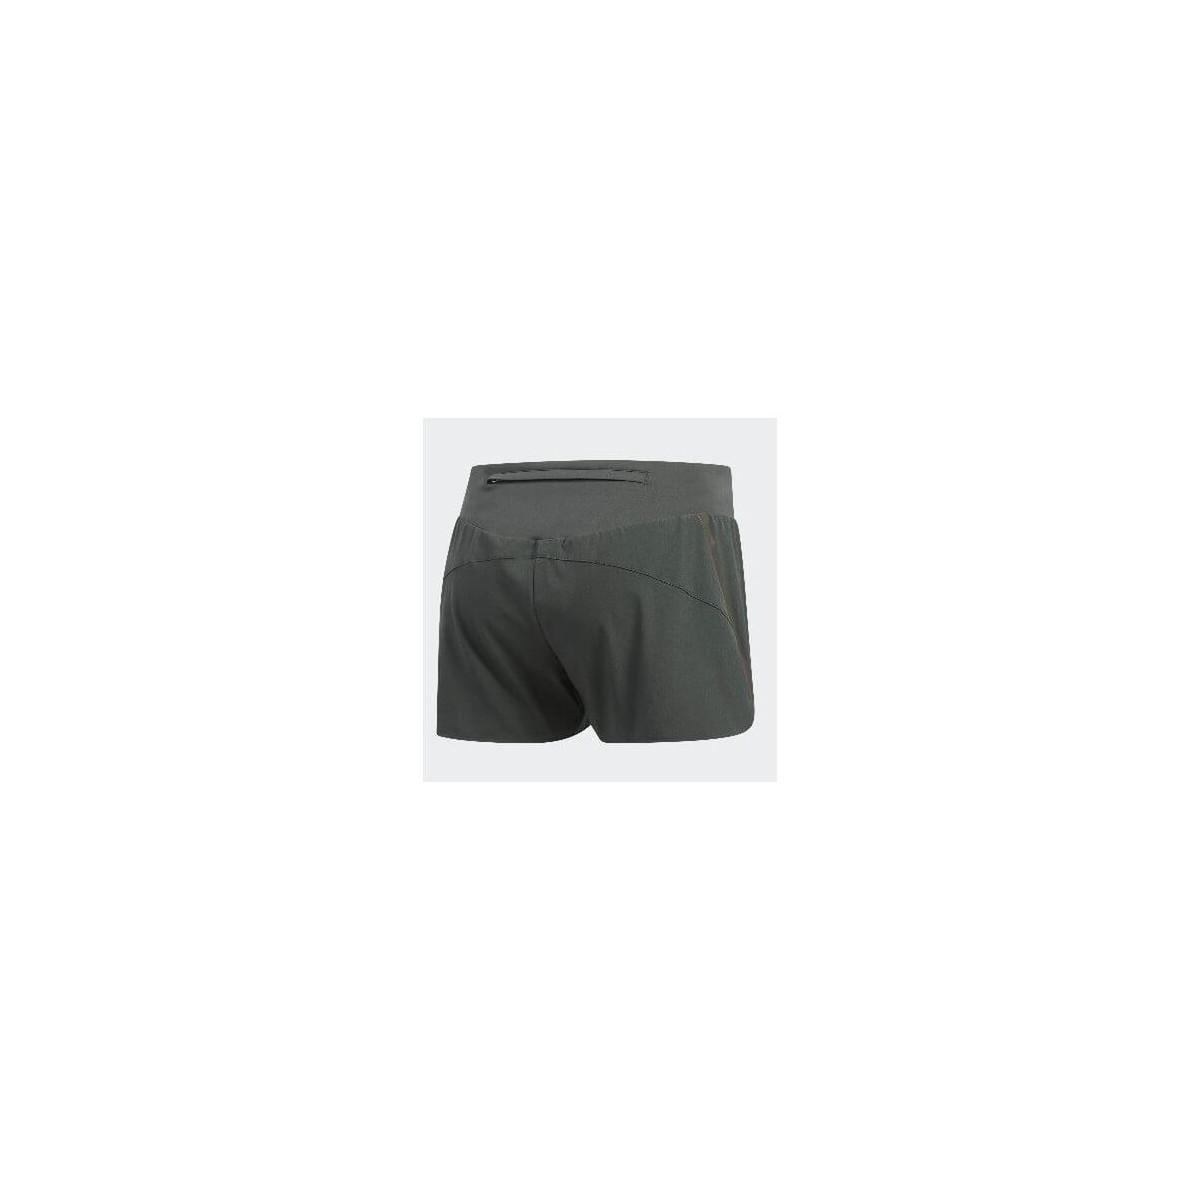 ee67454dbe Pantalón corto Adidas Saturday Short running Mujer Verde oscuro PV19 ...